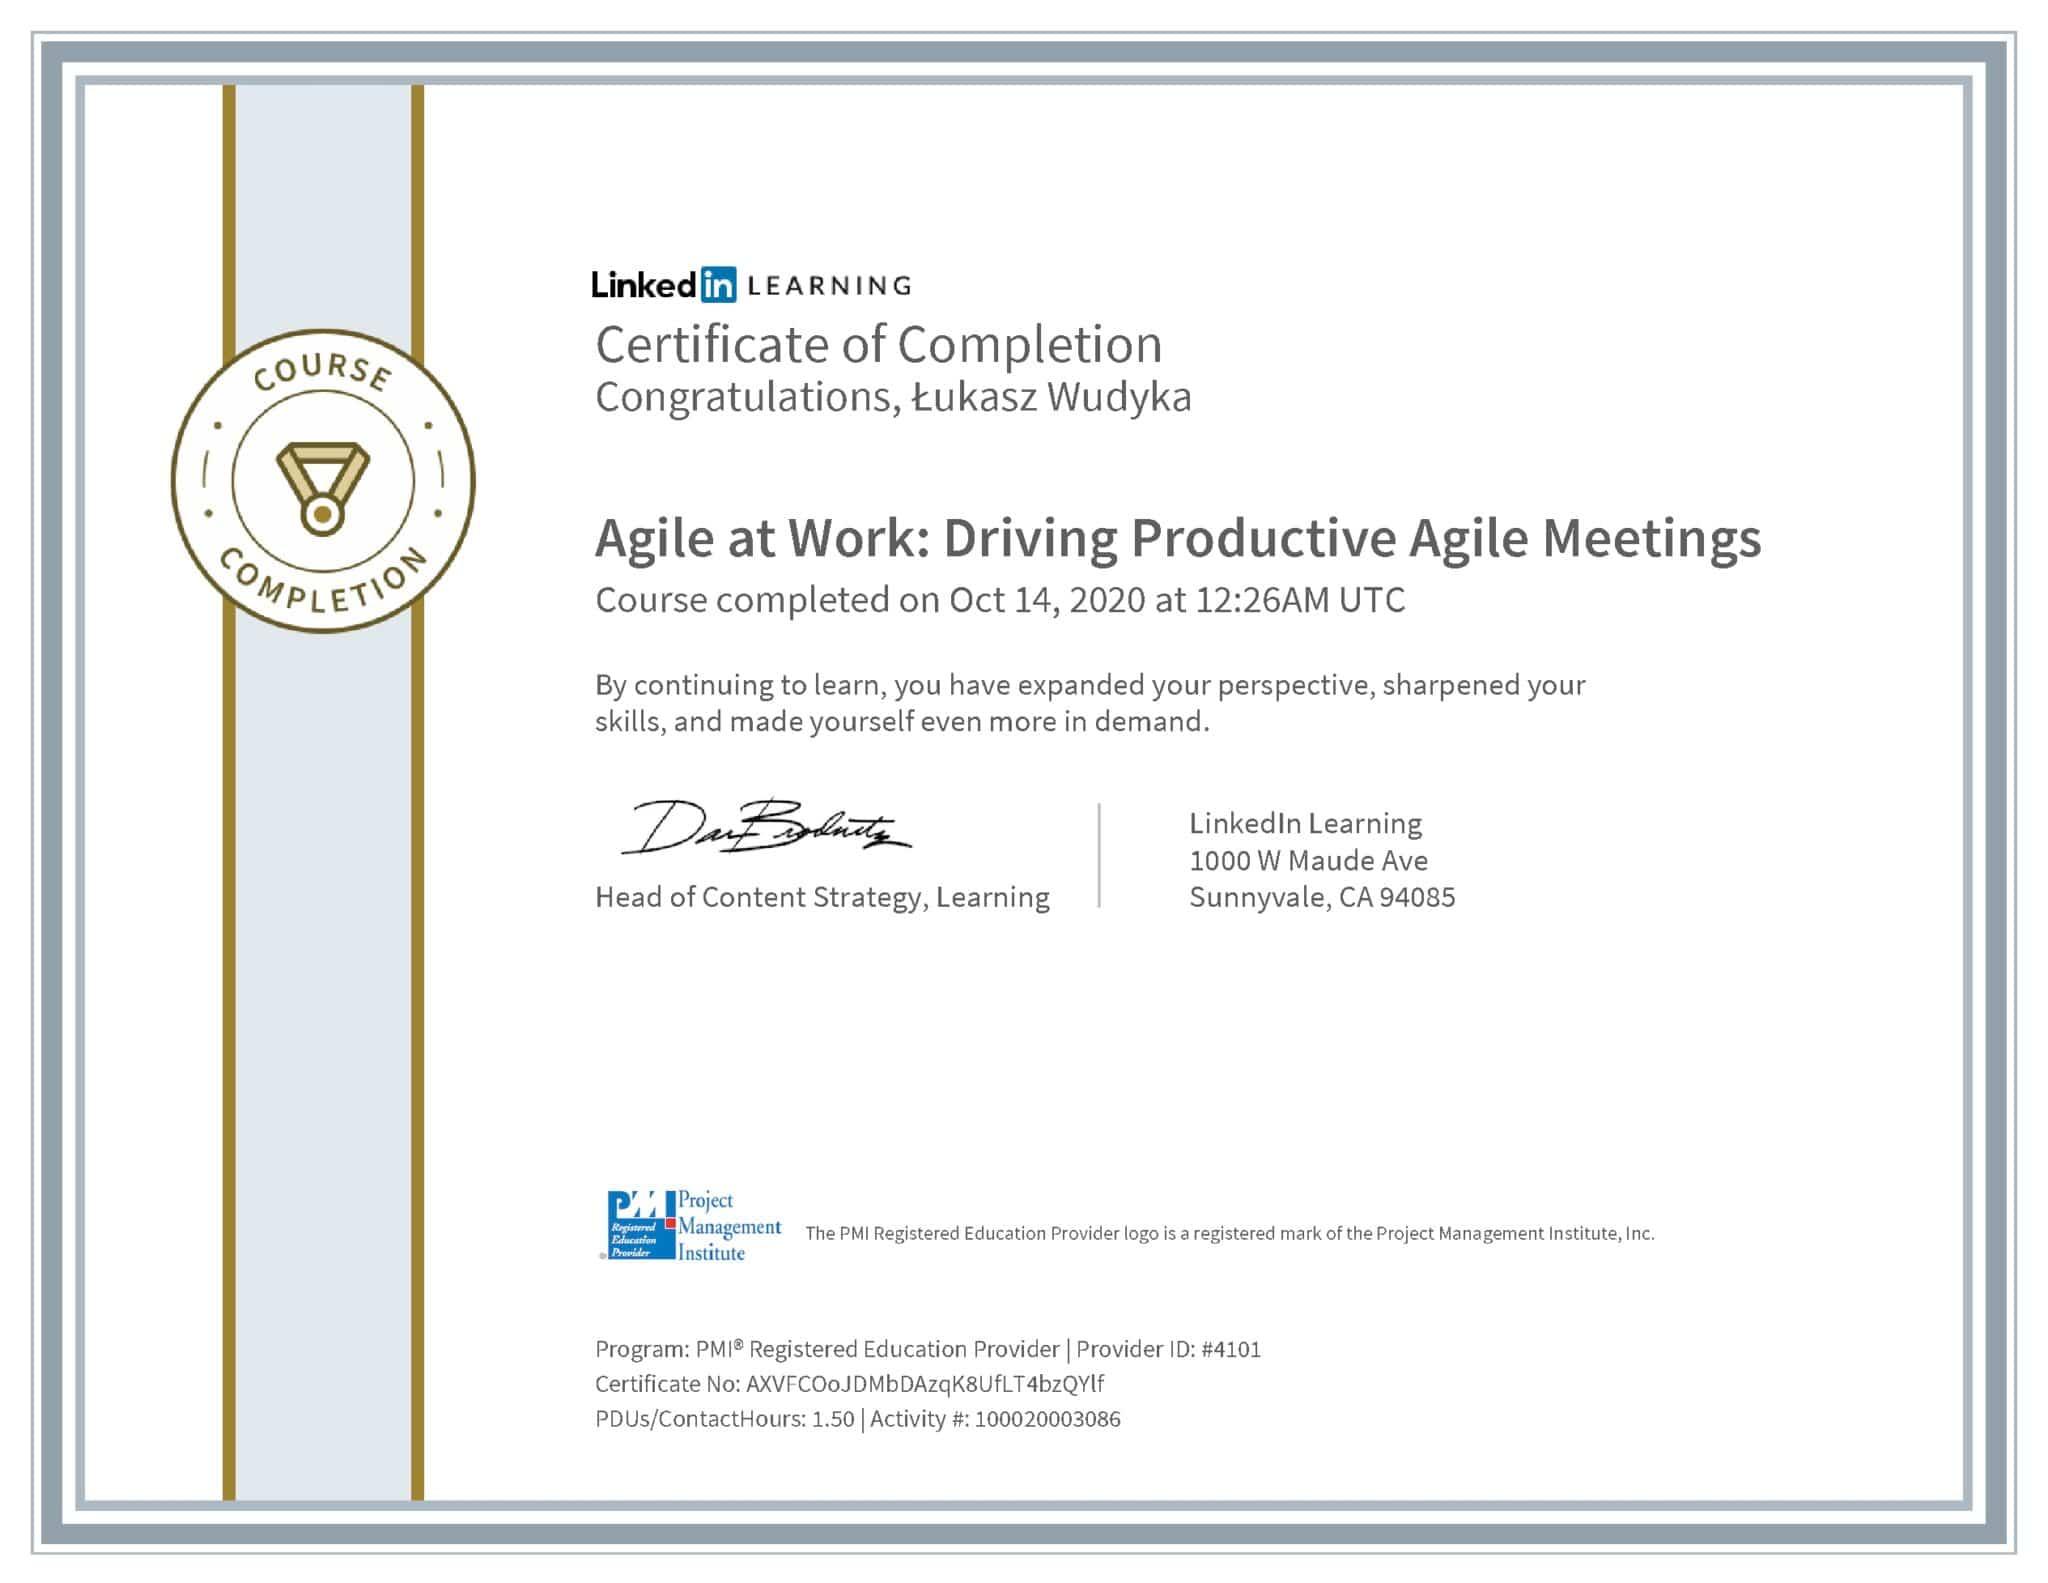 Łukasz Wudyka certyfikat LinkedIn Agile at Work: Driving Productive Agile Meetings PMI